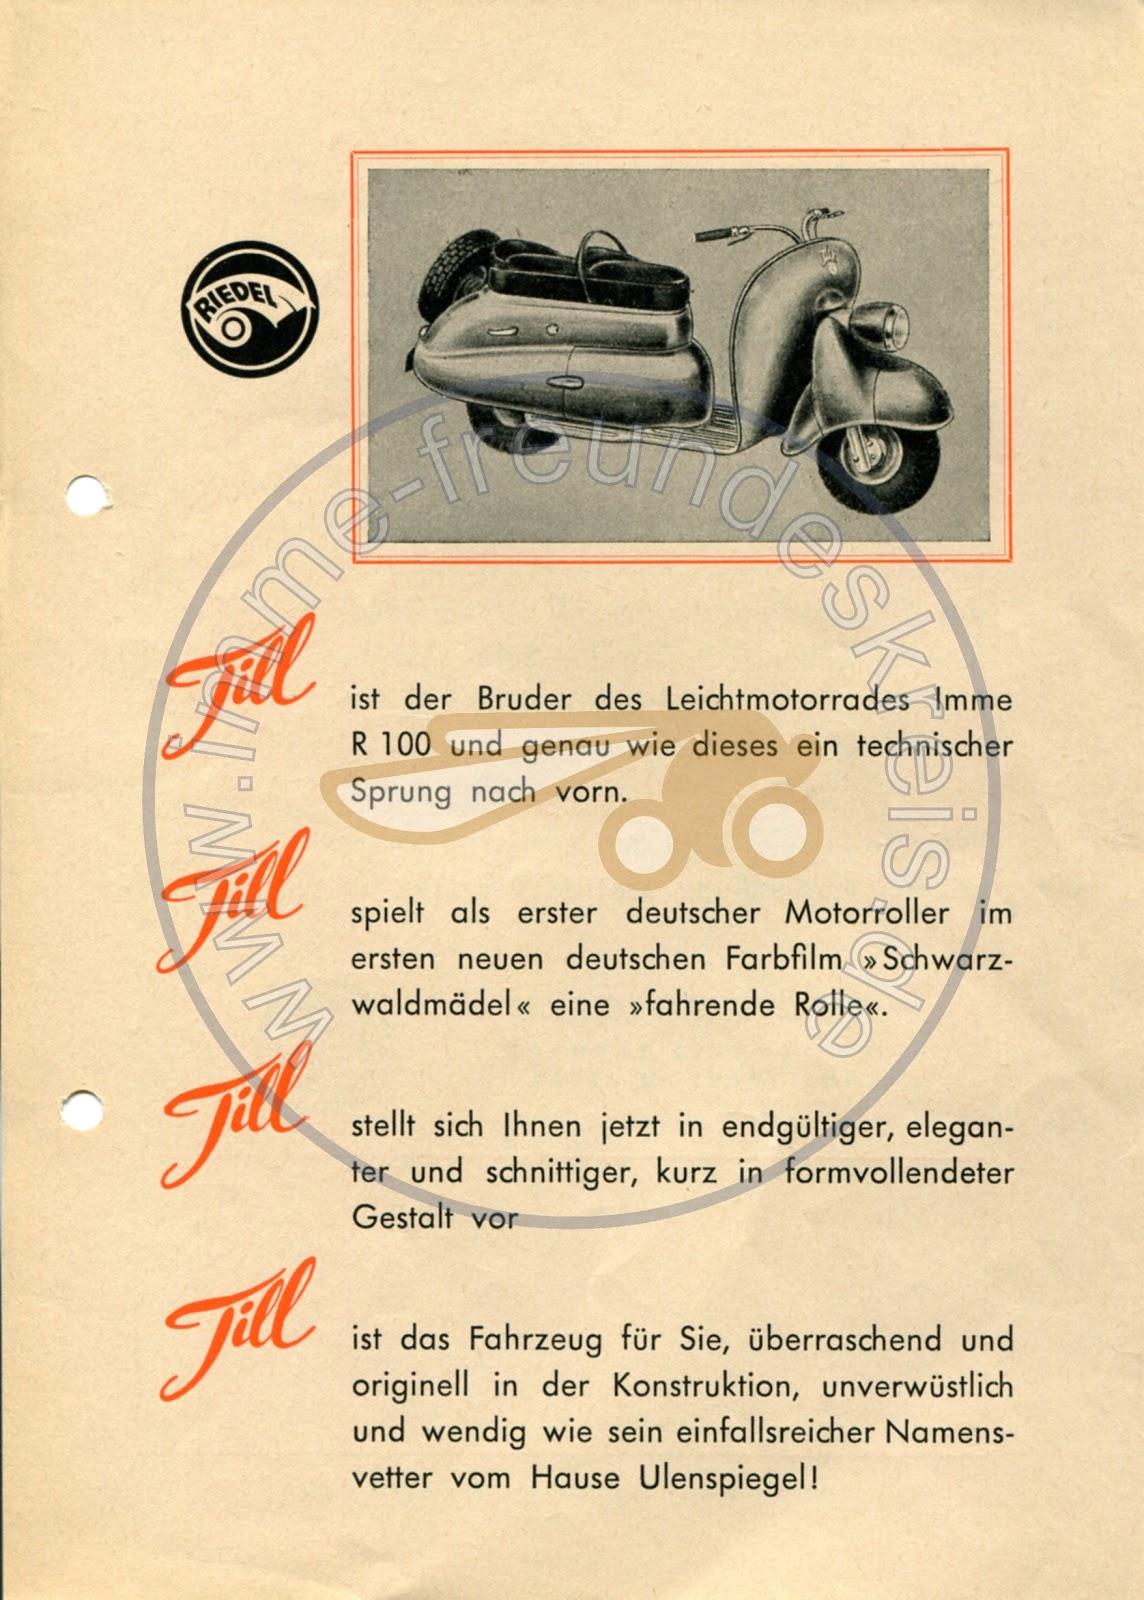 Riedel Till 100 Scooter Brochure